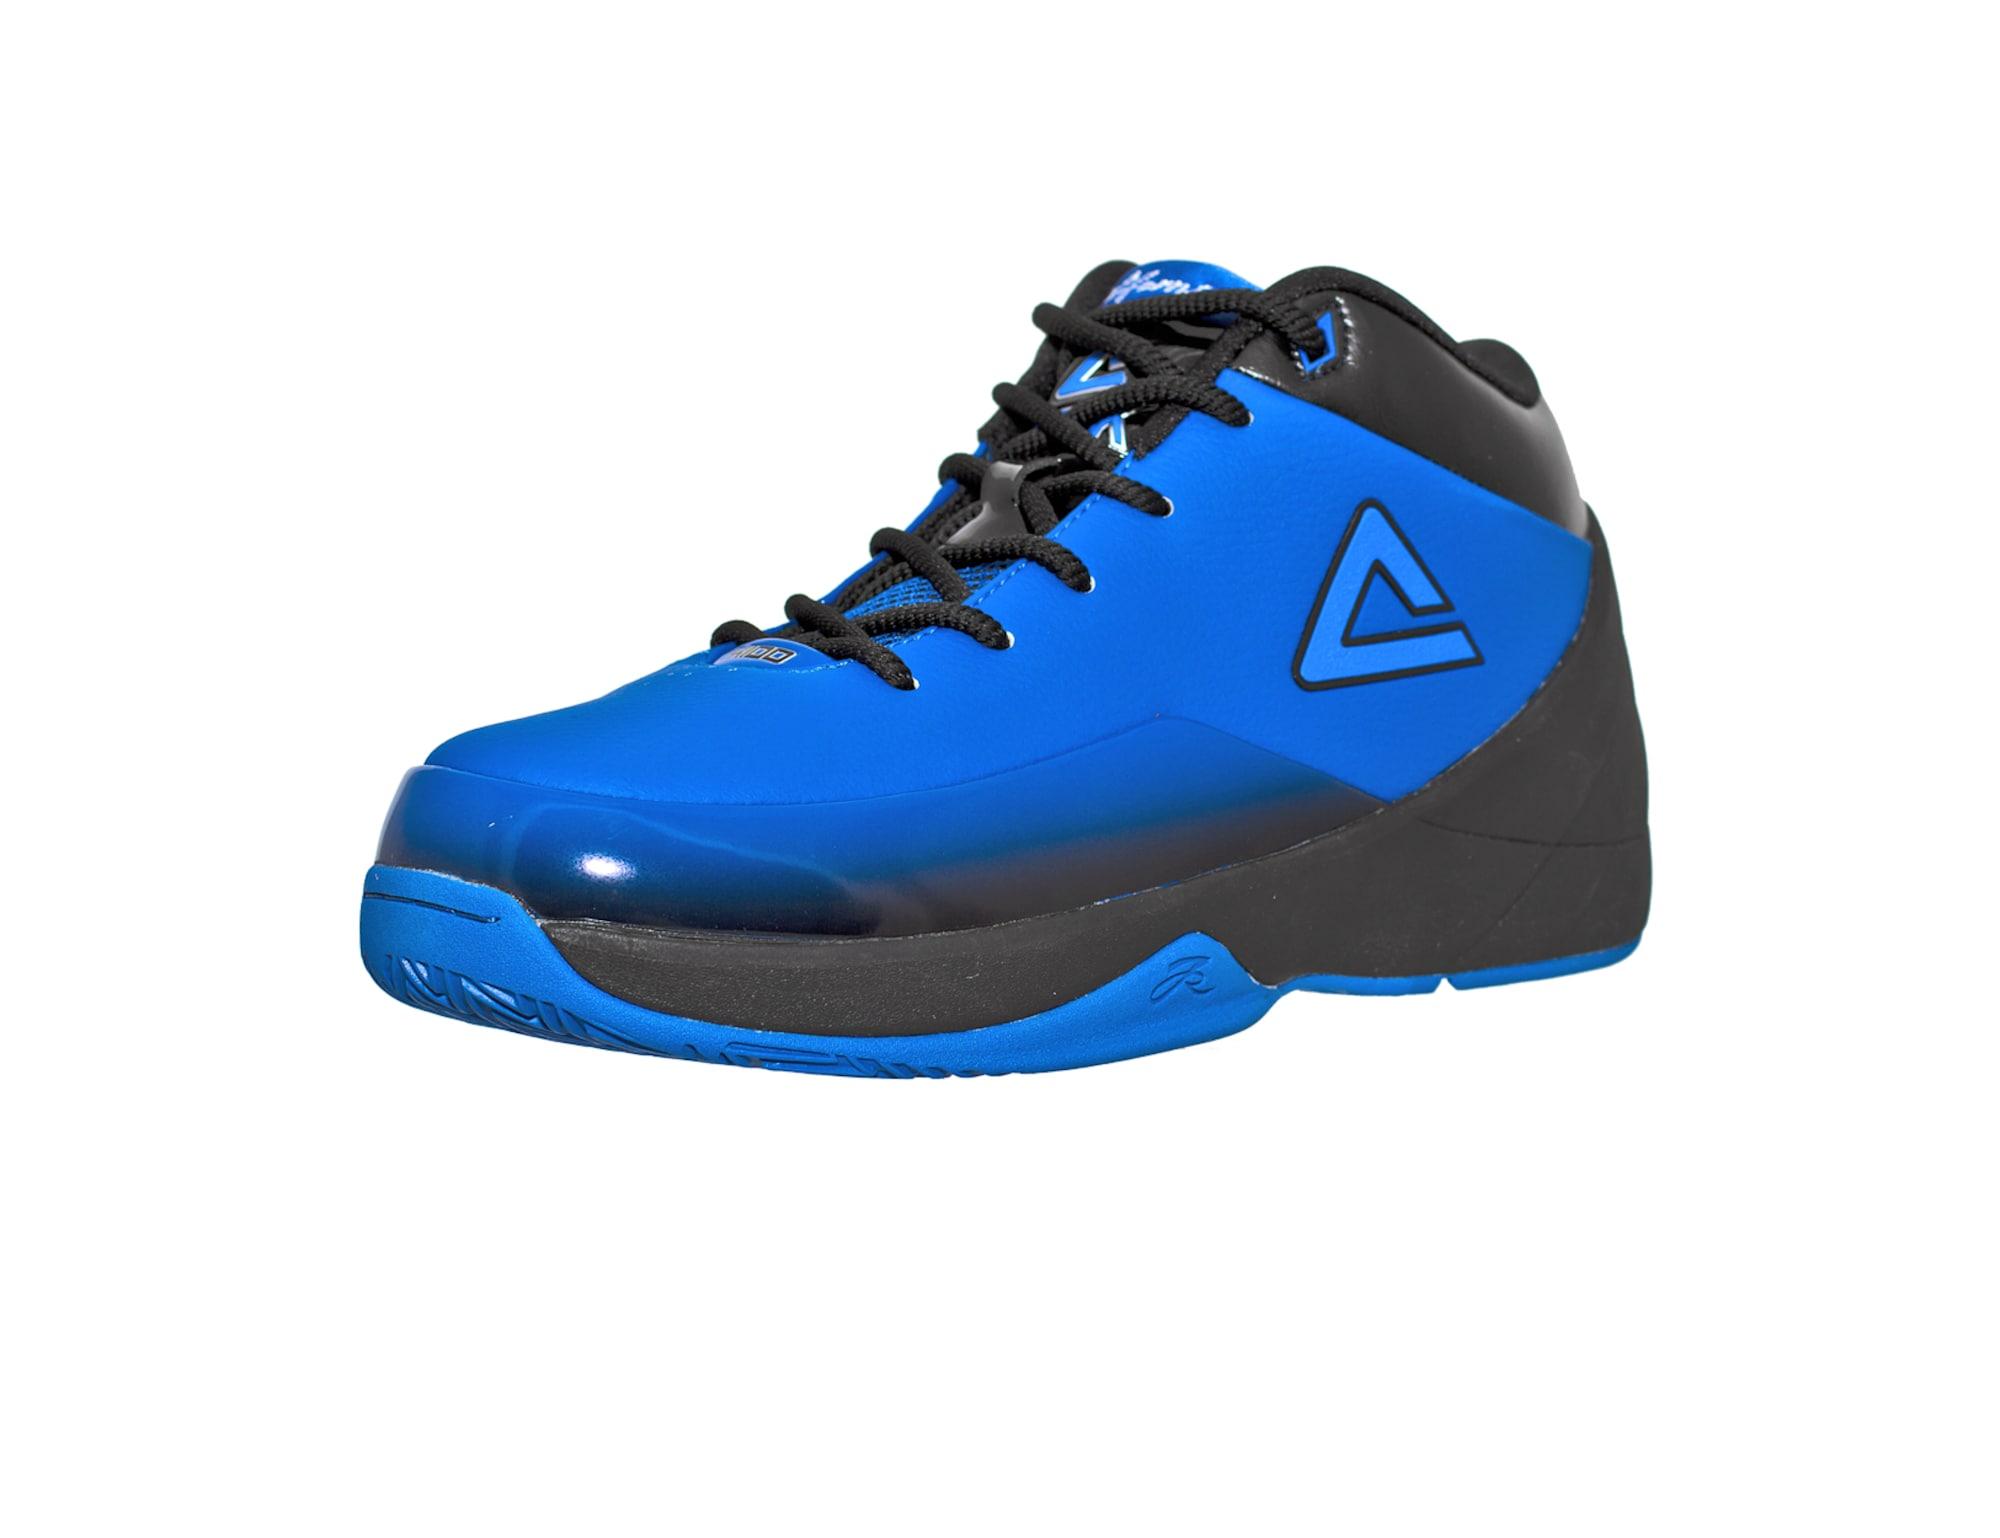 Basketballschuh Jason Kidd III Signature | Schuhe > Sportschuhe > Basketballschuhe | Peak